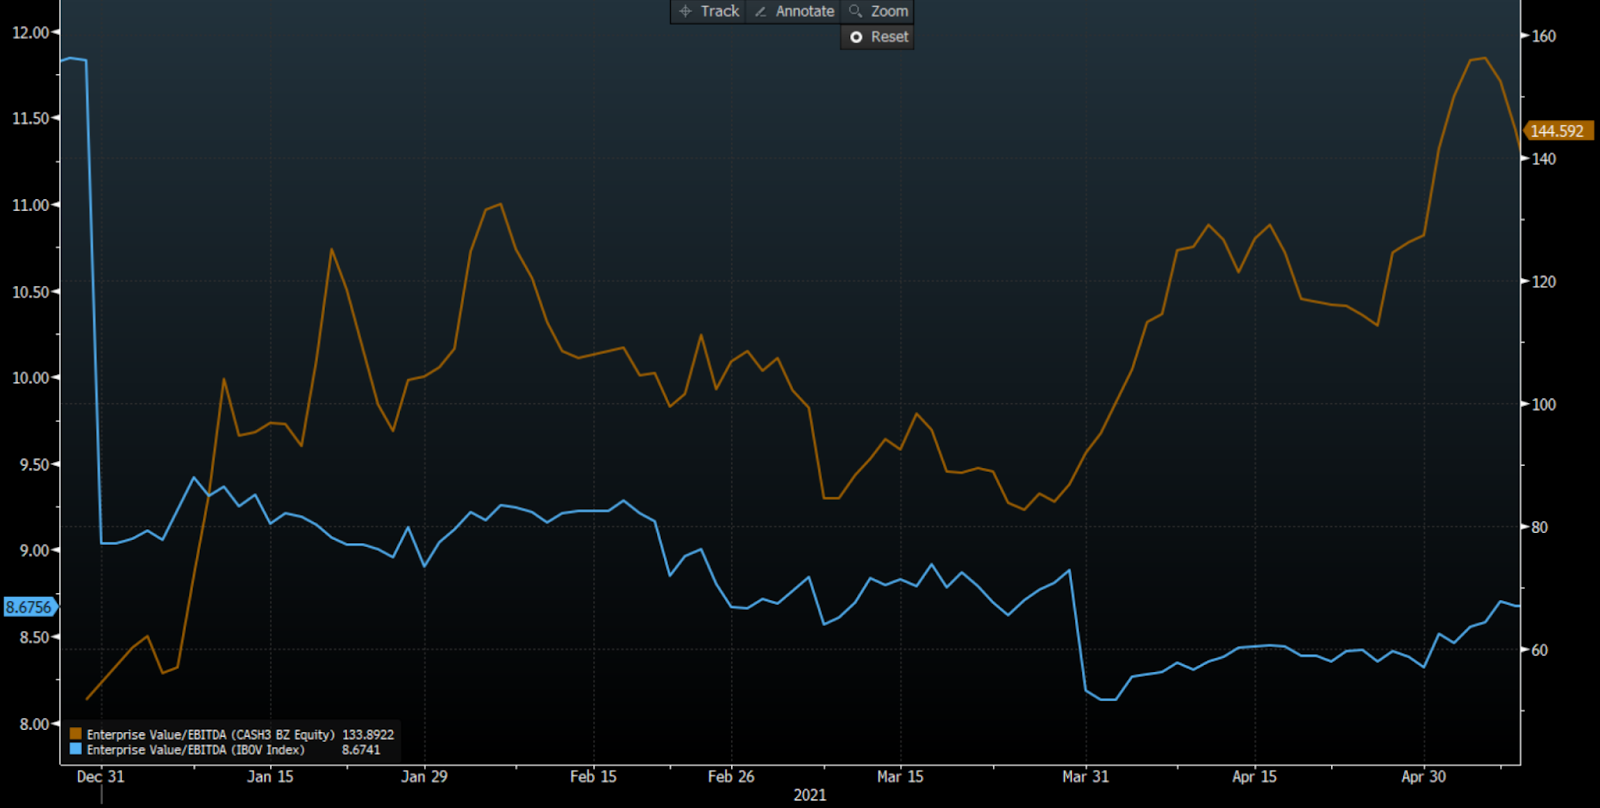 EV/Ebitda (laranja) e Ibovespa (azul) (Fonte: Bloomberg)